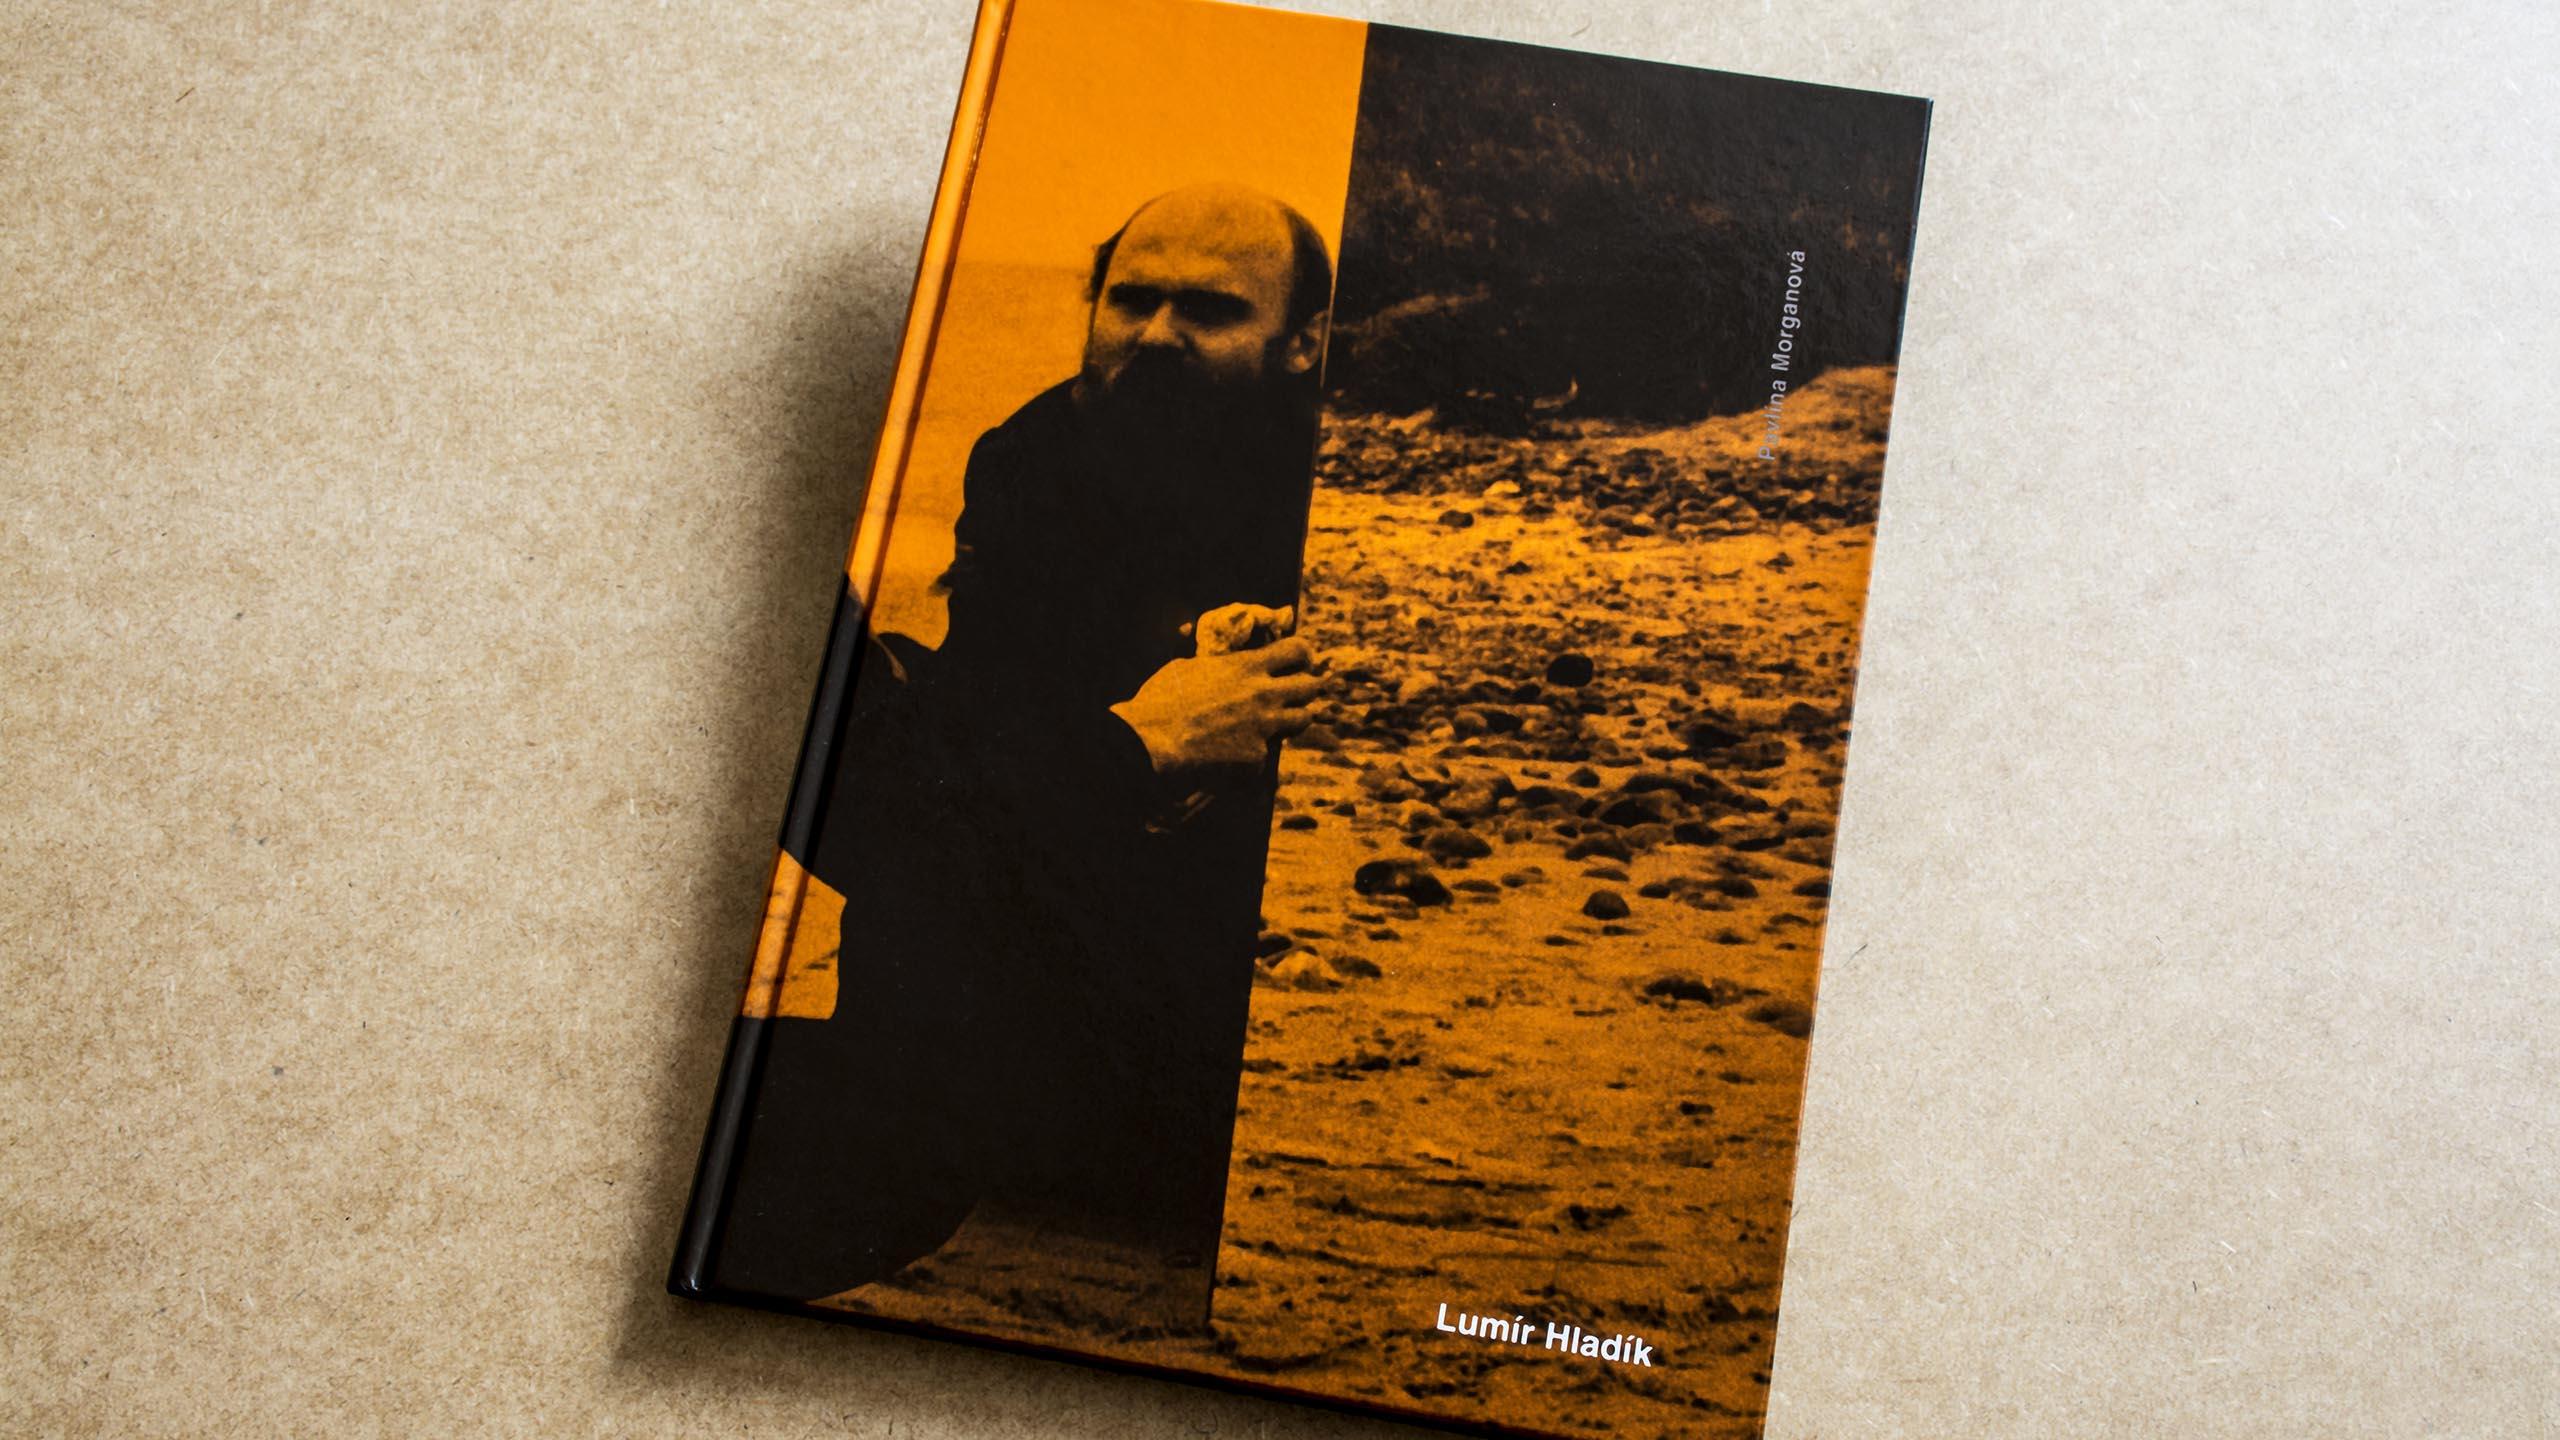 Lumir Hladik, art Monograph